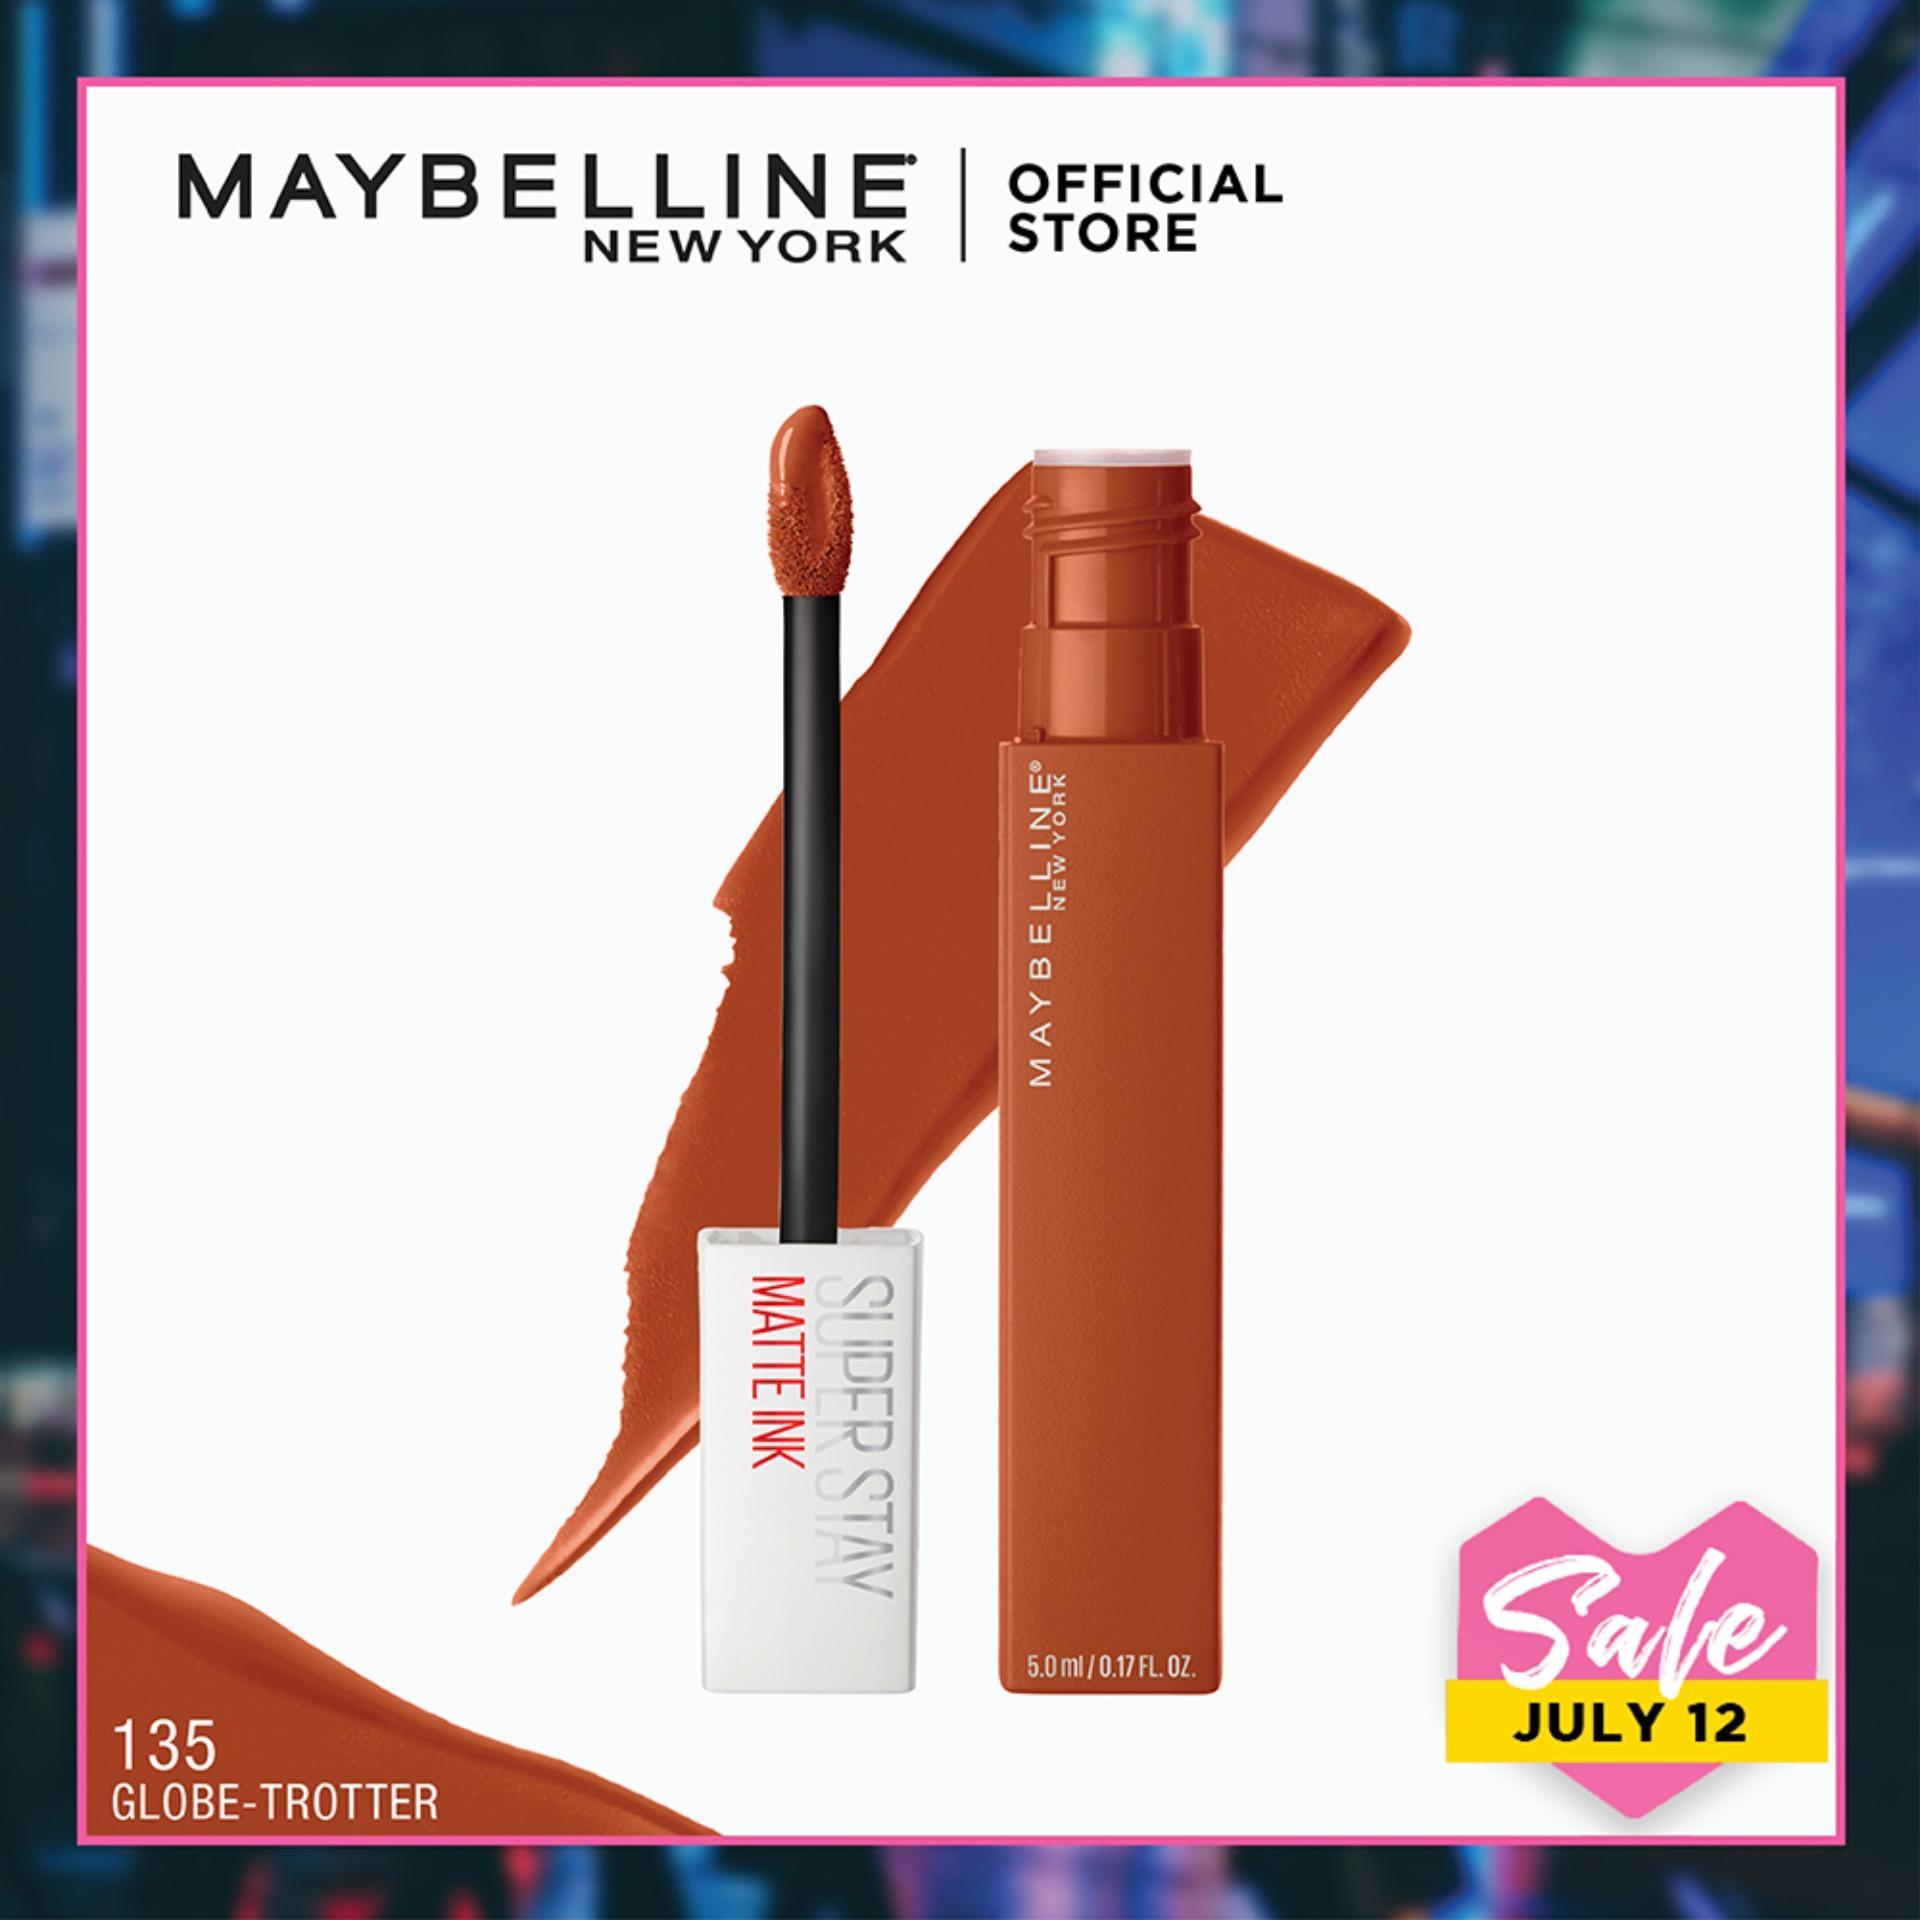 52b0e41f03 Maybelline SuperStay Matte Ink City Edition Liquid Lipstick [16HR  Waterproof]